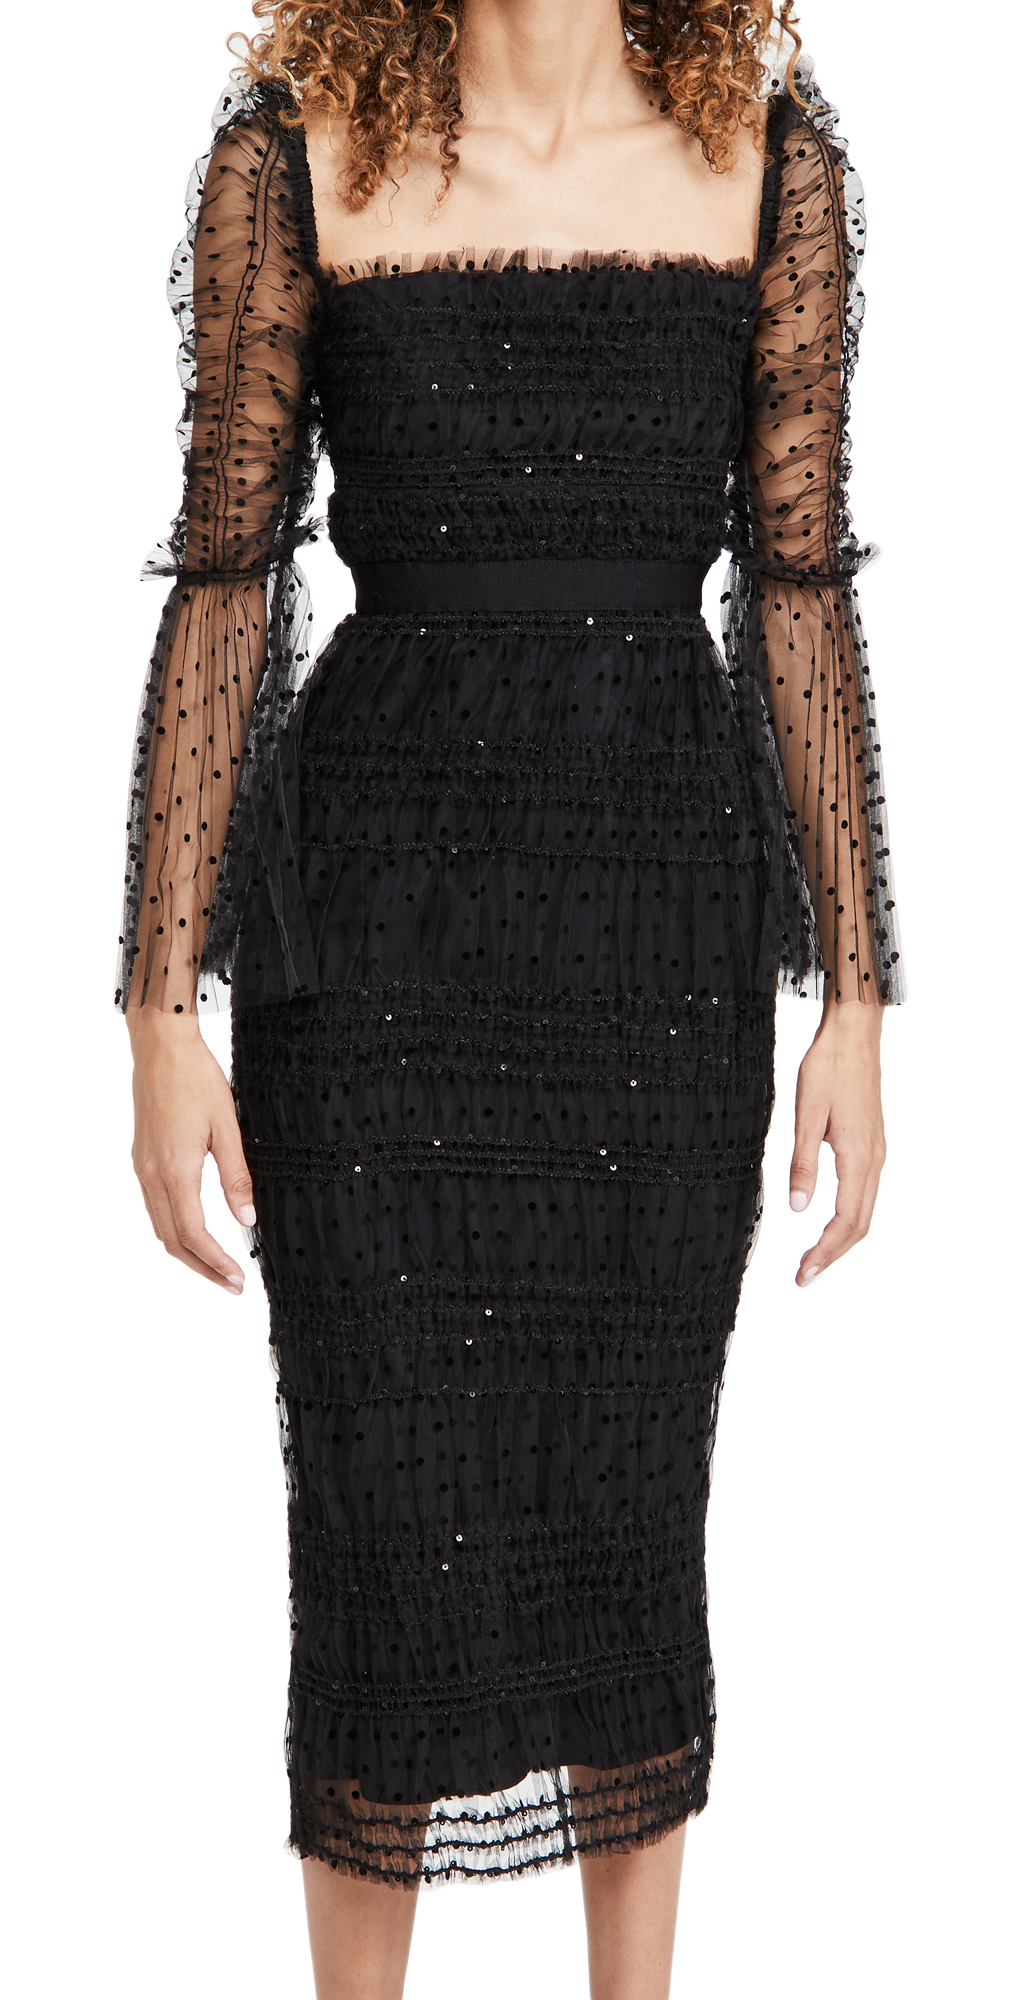 Self Portrait Black Dot Mesh Midi Dress